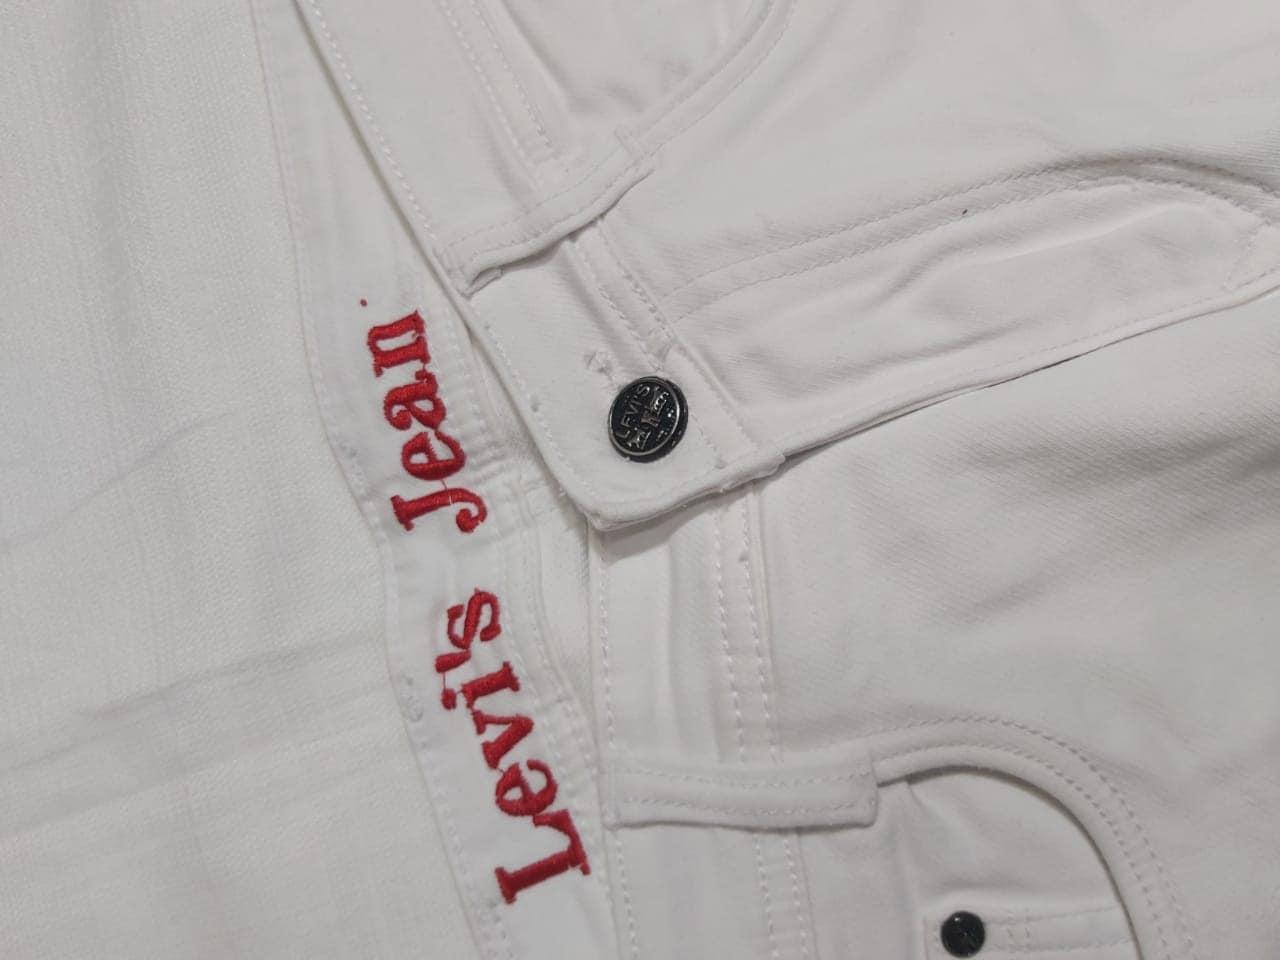 MEN'S JEANS LJ01 WHITE COLOR SOLID NARROW FIT HEAVY JEANS (30)